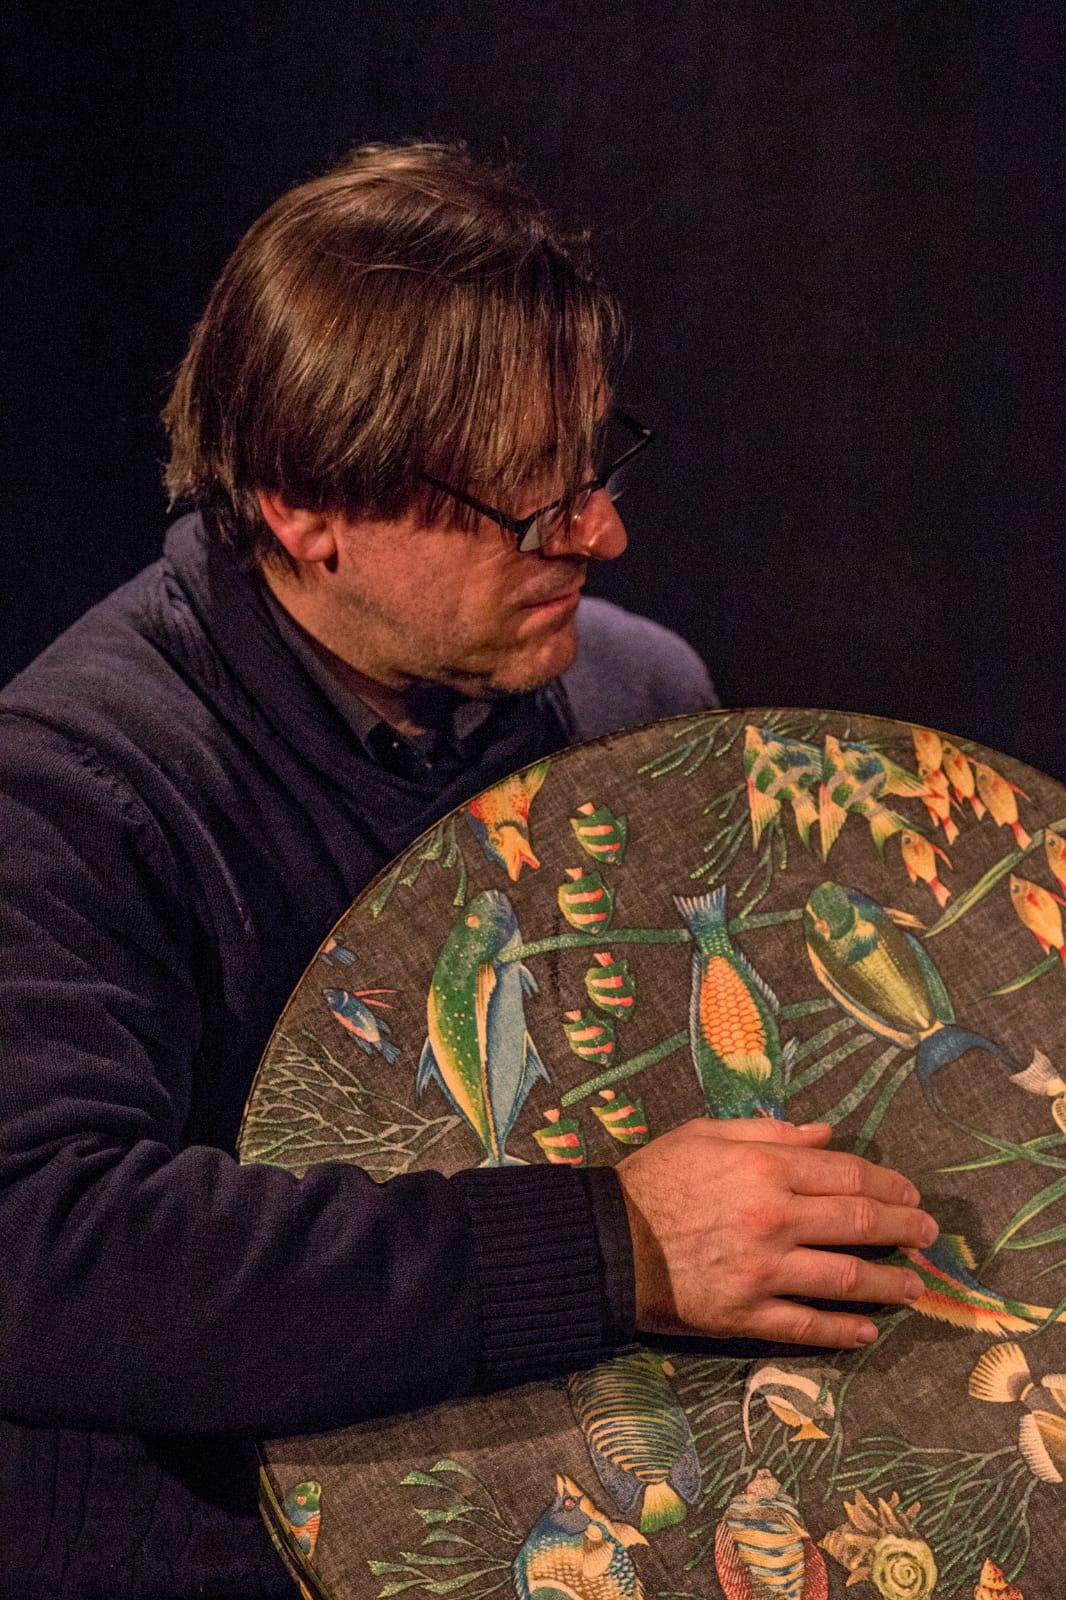 Percussionist - Günter Bozem